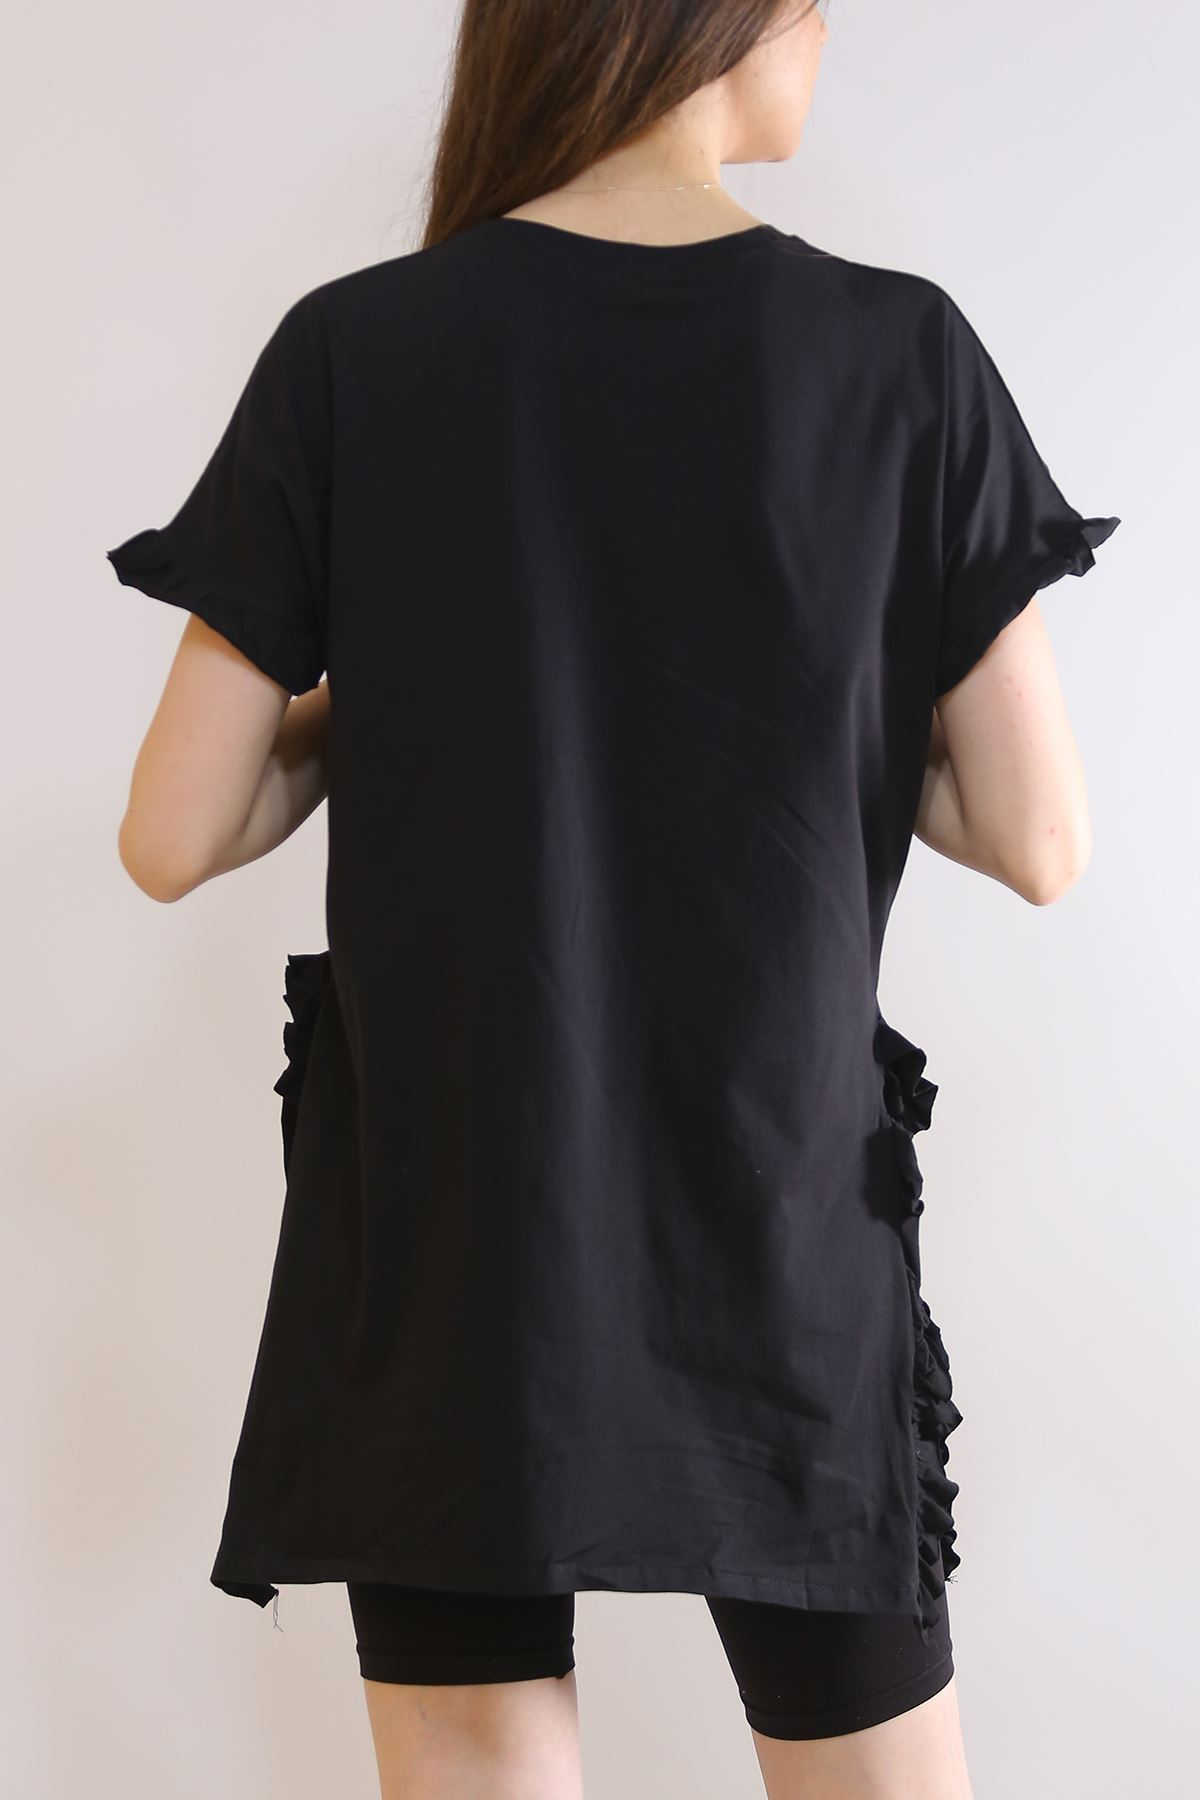 Altı Fırfırlı Tişört Siyah - 2984.105.